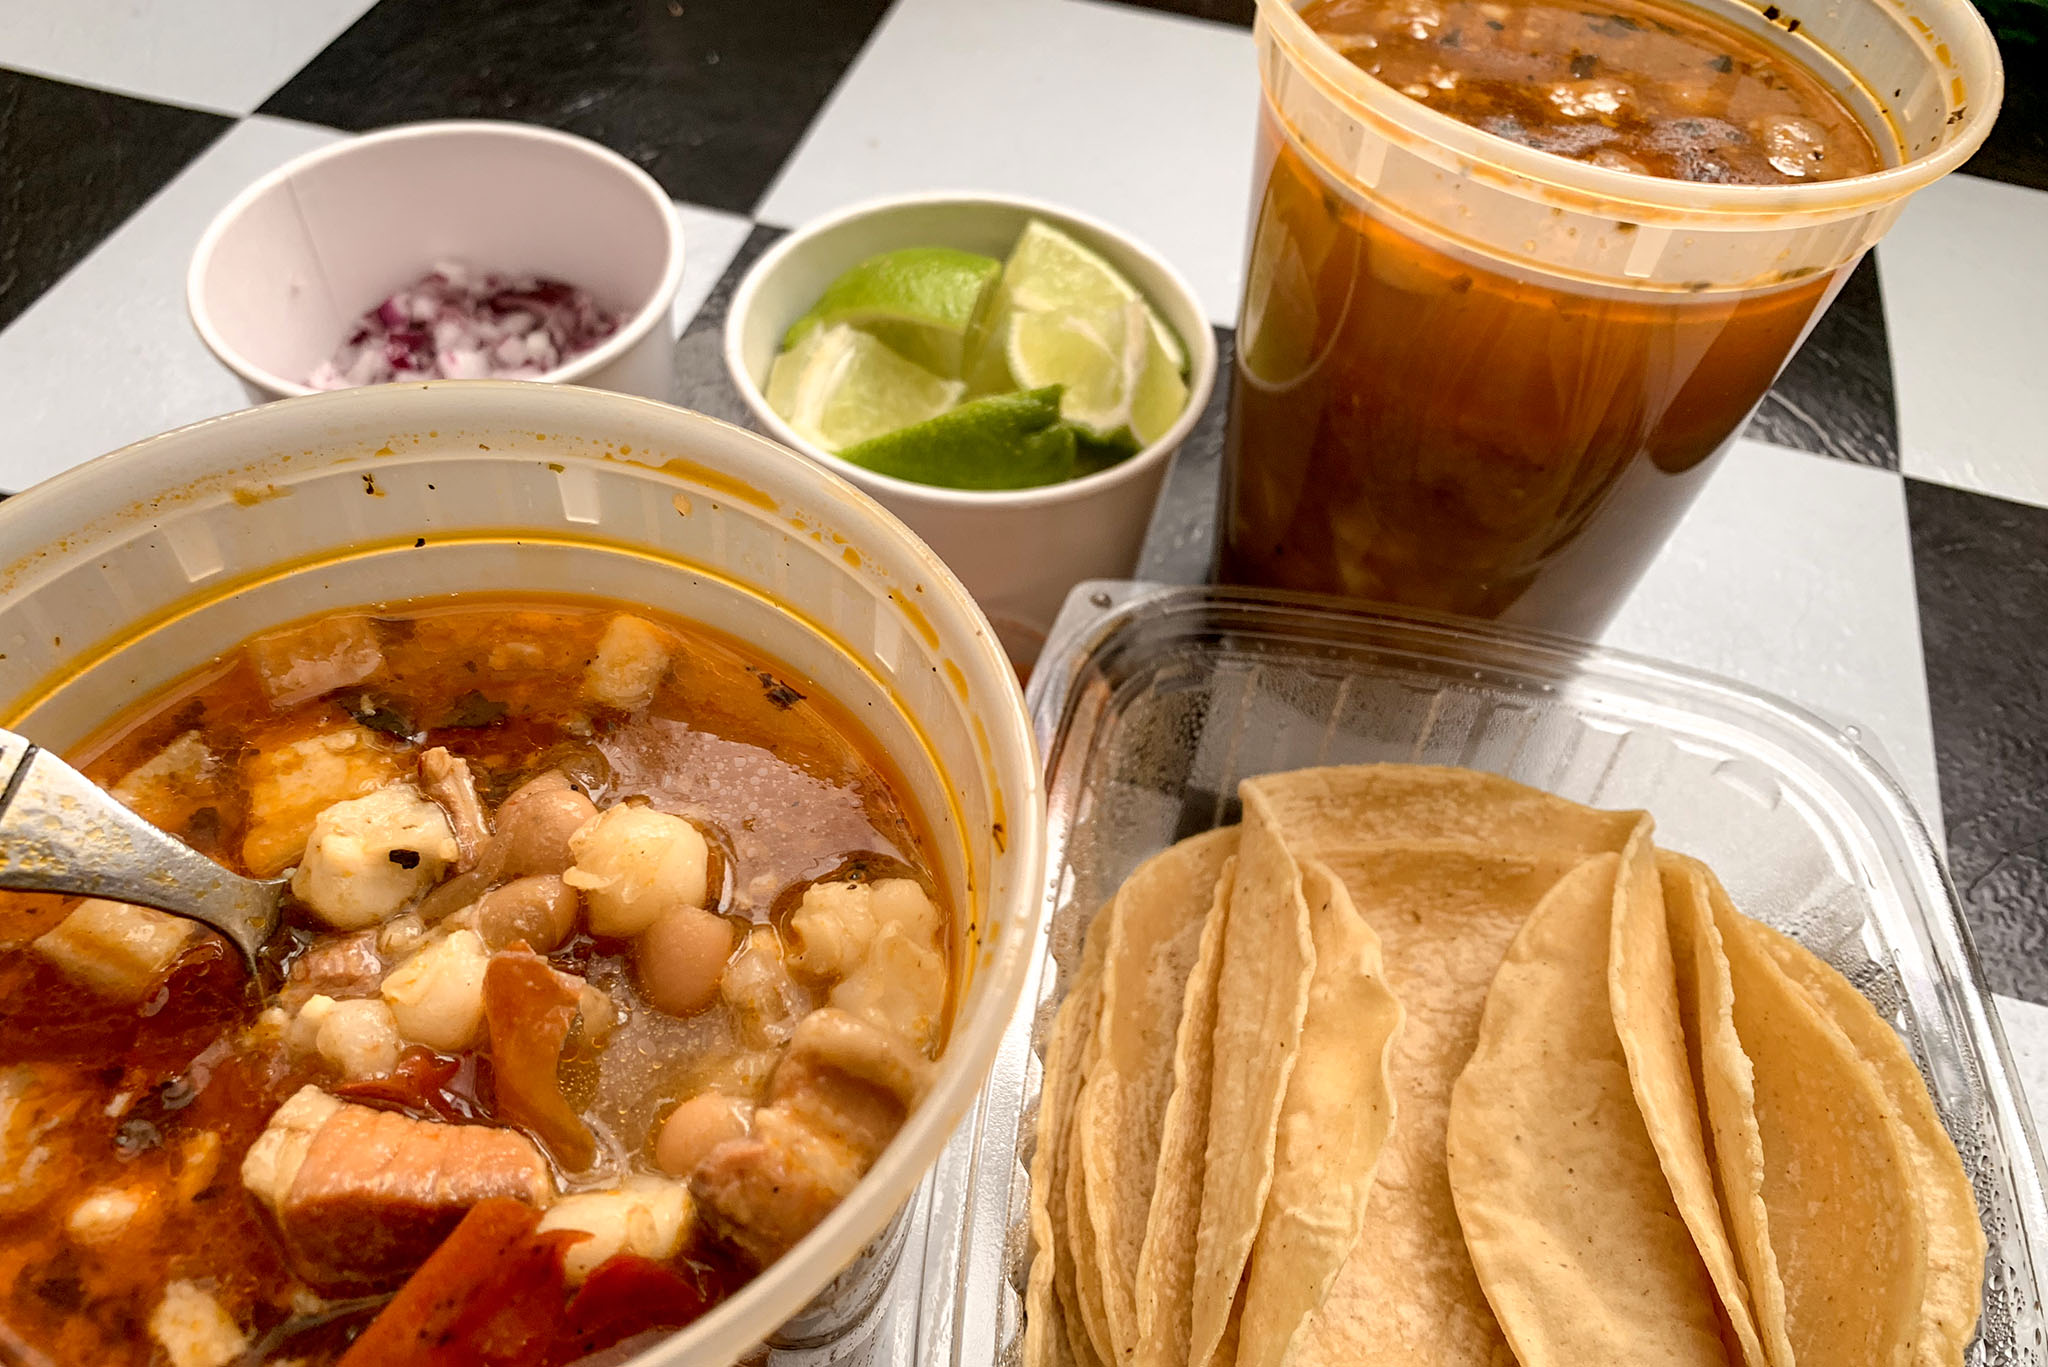 The latest coronavirus restaurant trend: family meals